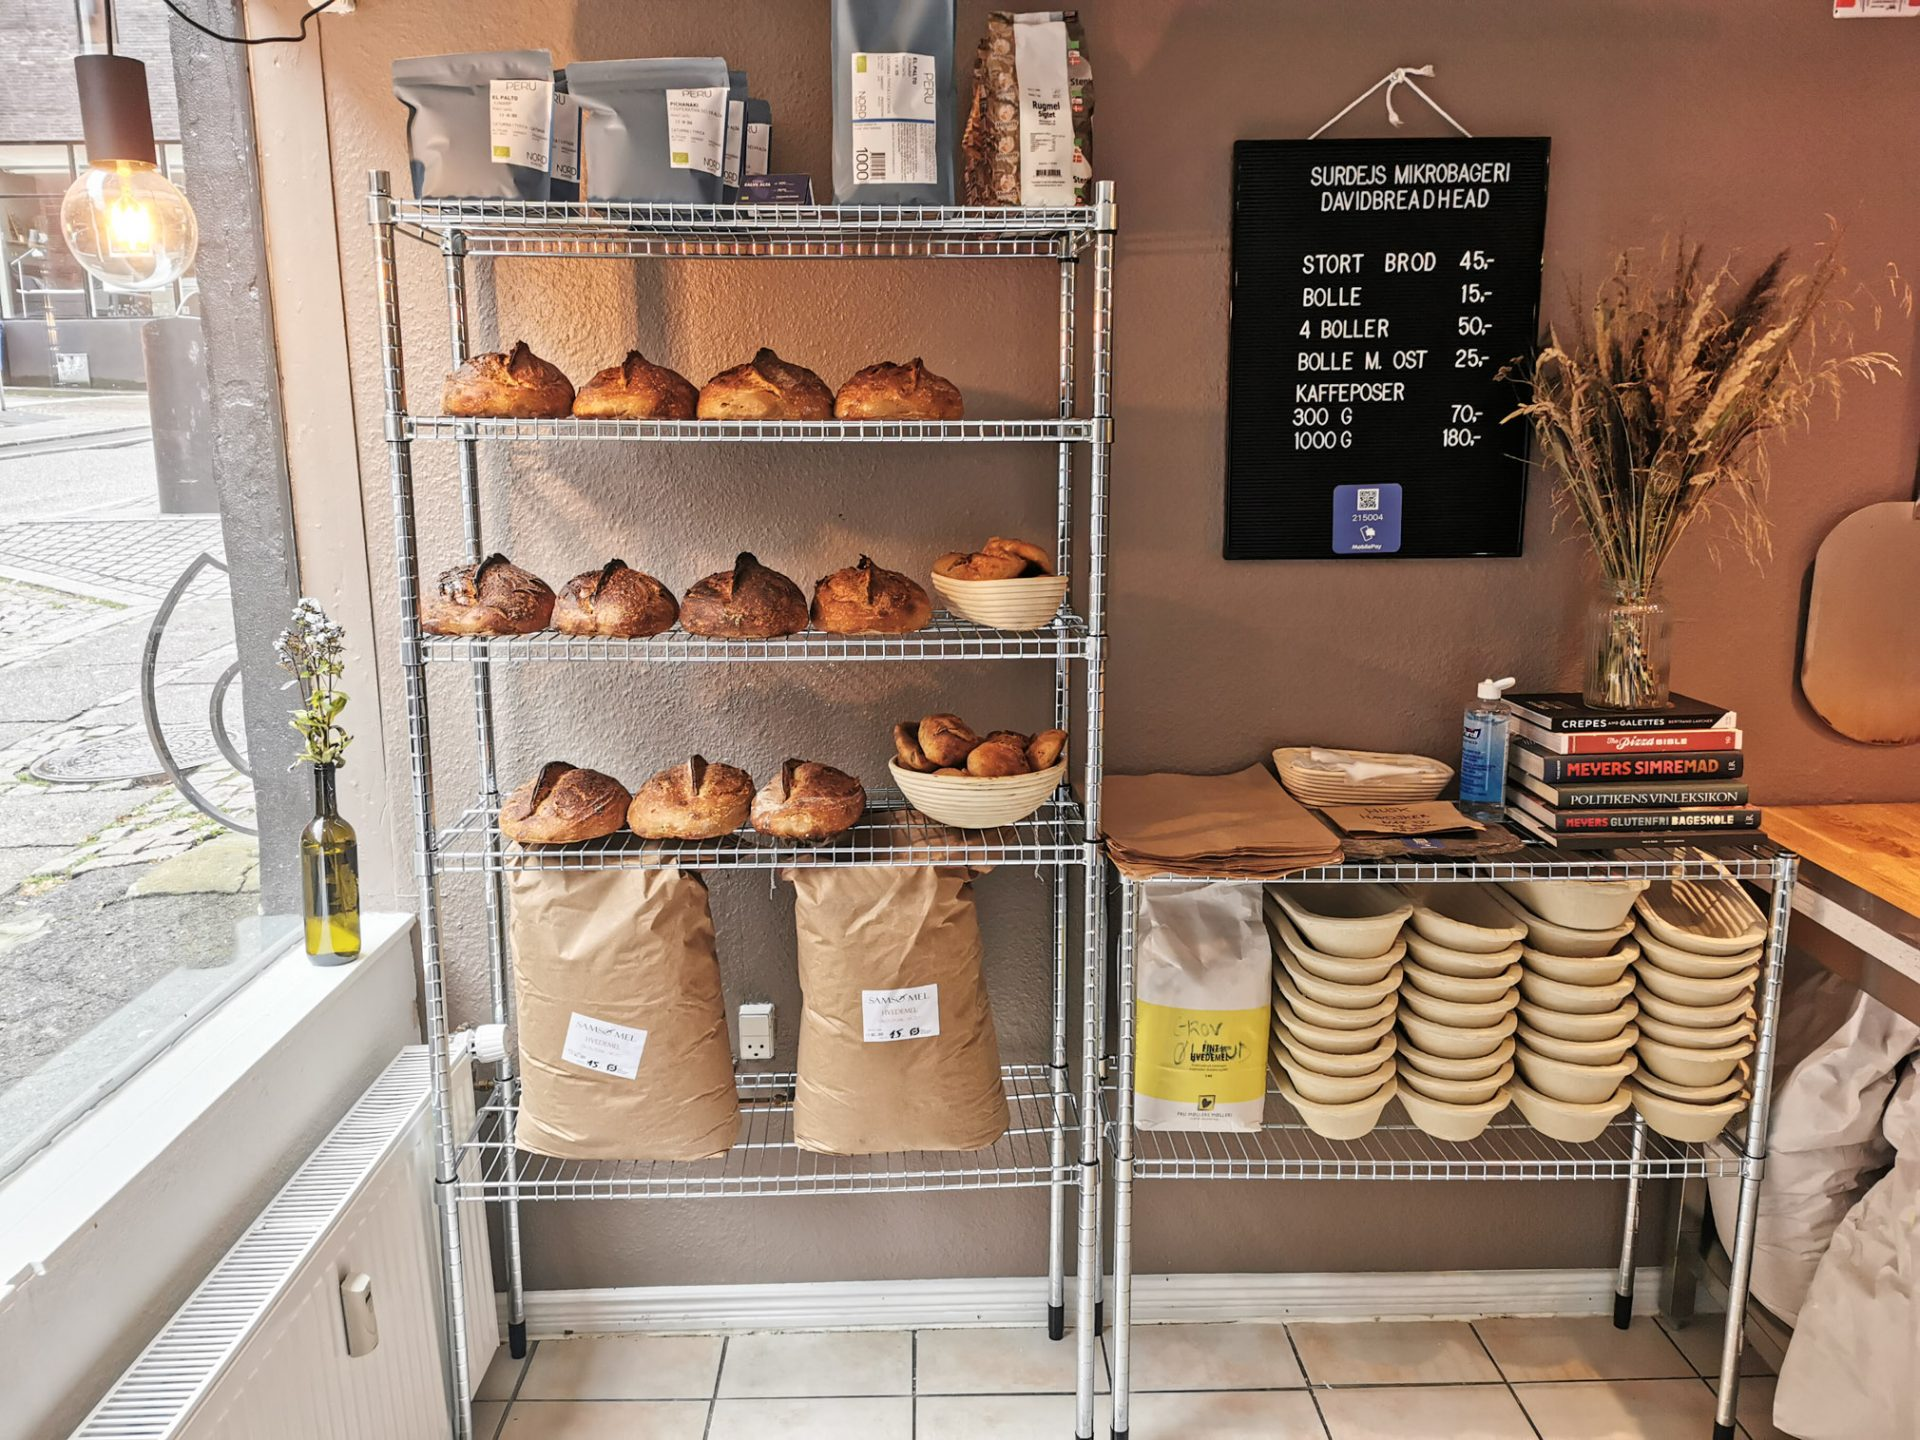 Davidbreadhead Baking Studio: Ny cool mikrobager vil bage Aarhus´ bedste brød